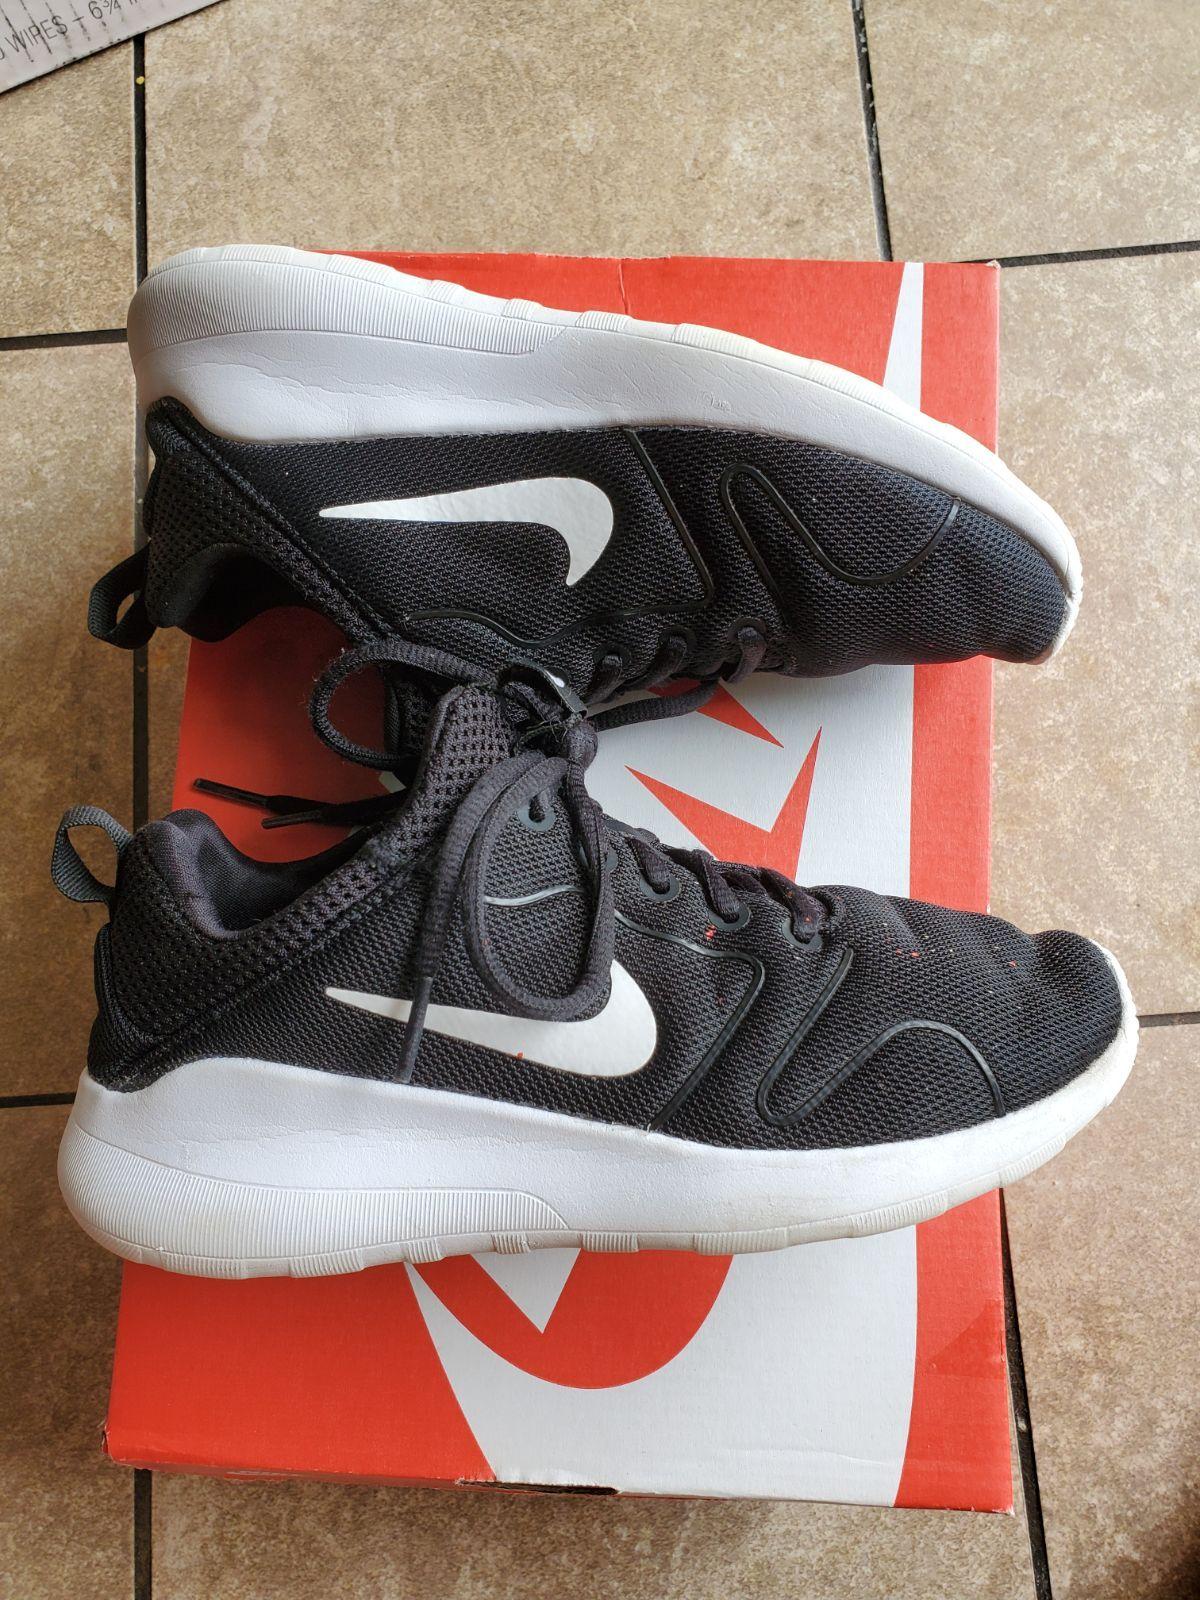 Nike, Sneakers nike, Nike shoes